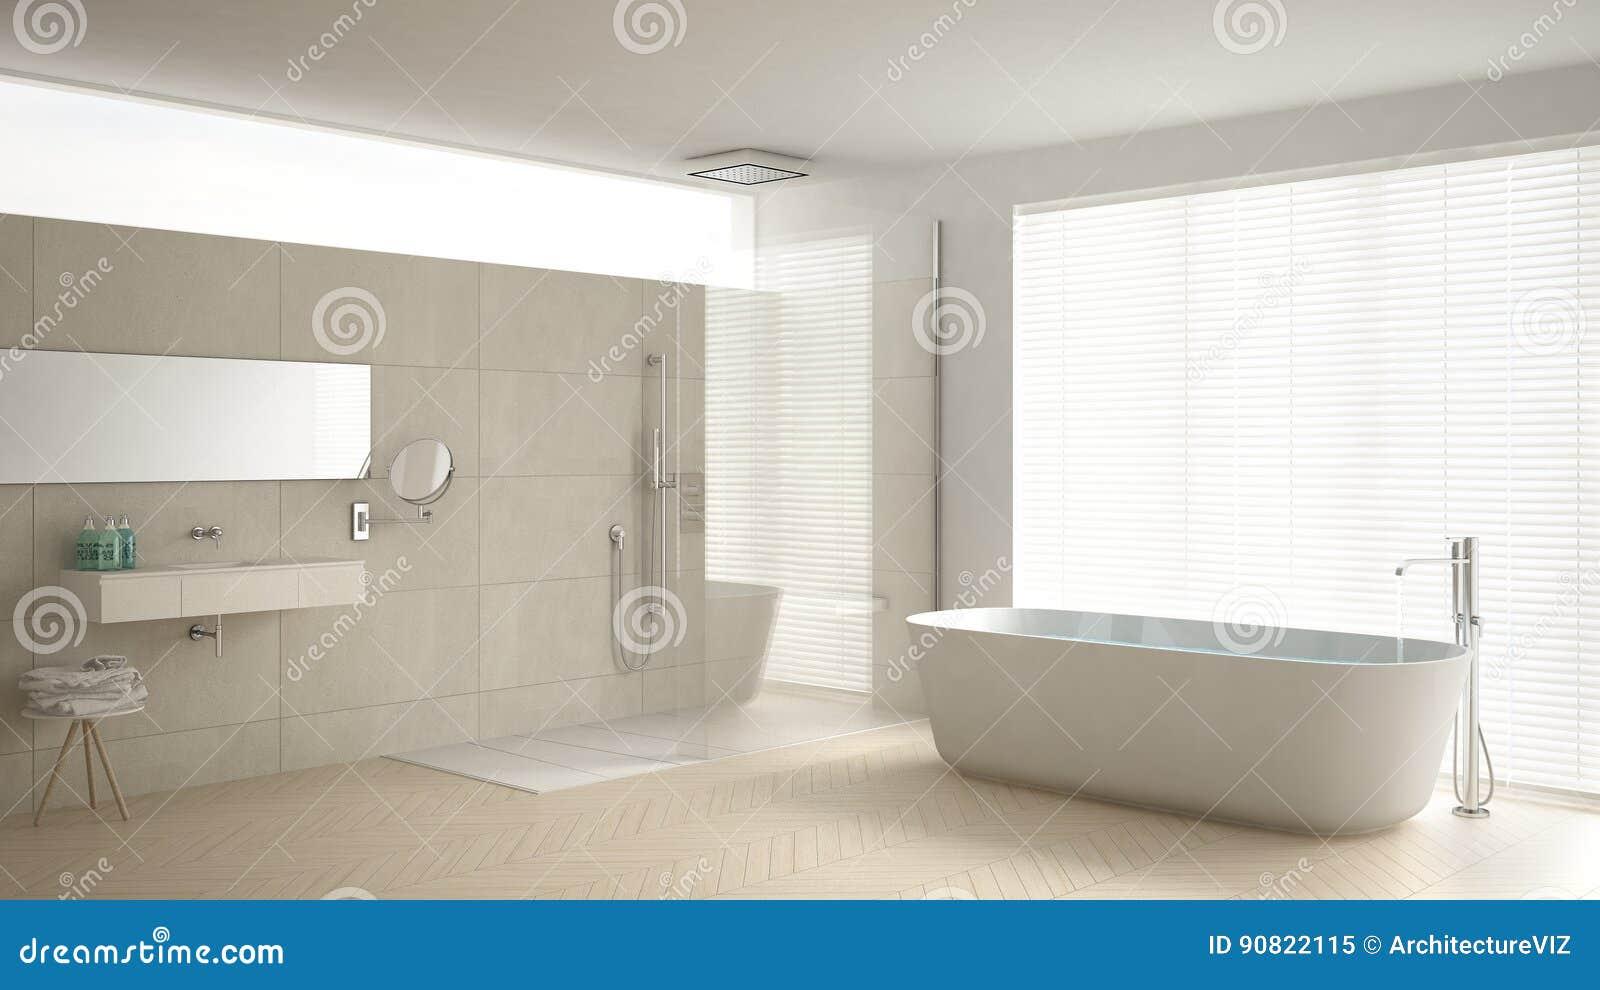 Minimalist Bathroom With Bathtub And Shower, Parquet Floor And M ...